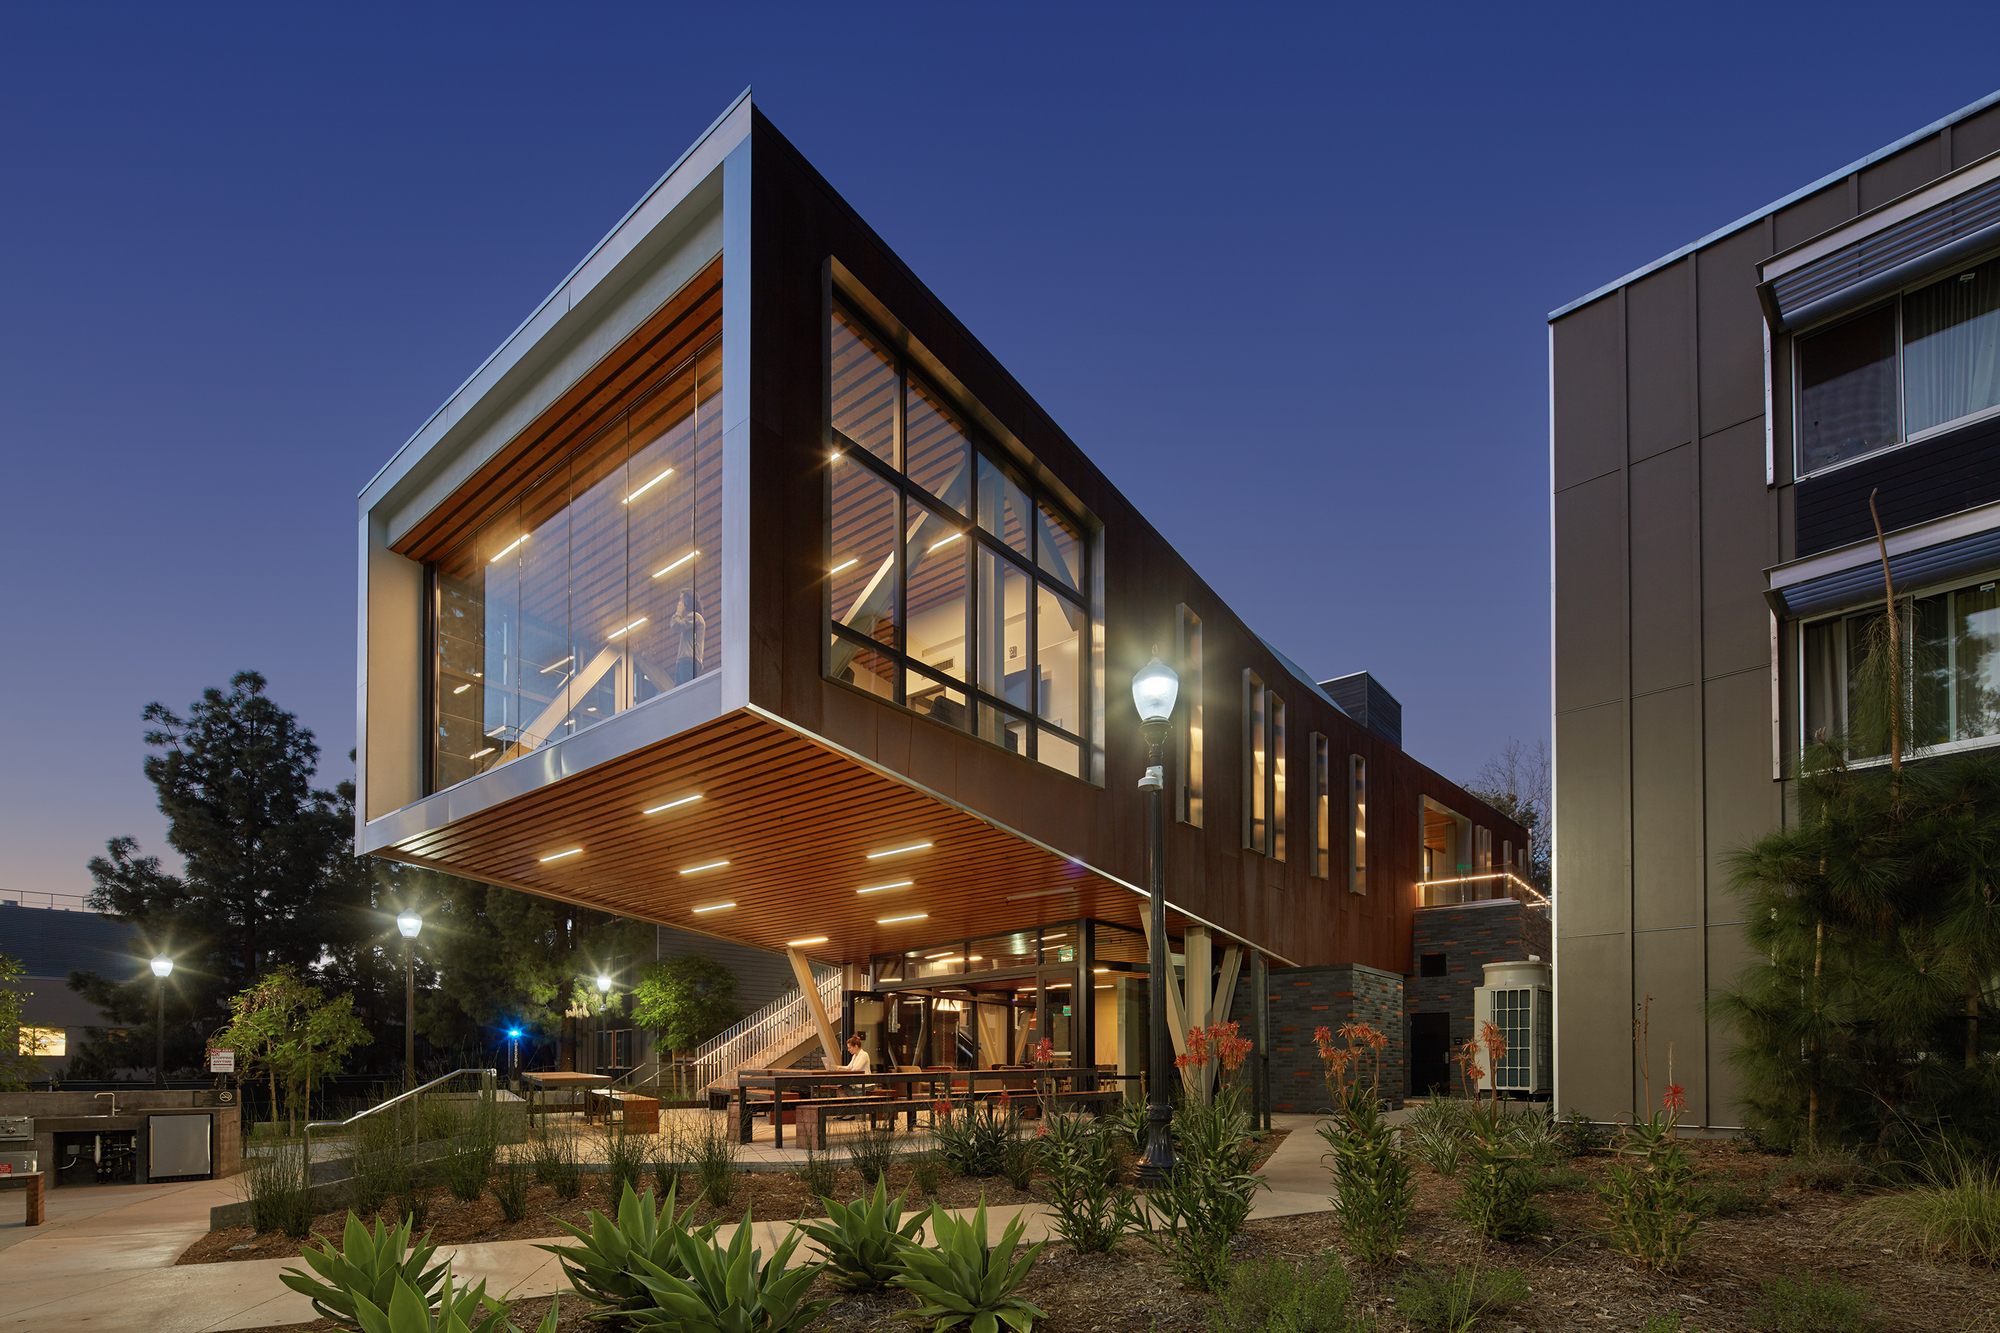 medium resolution of ucla saxon suites studio e architects